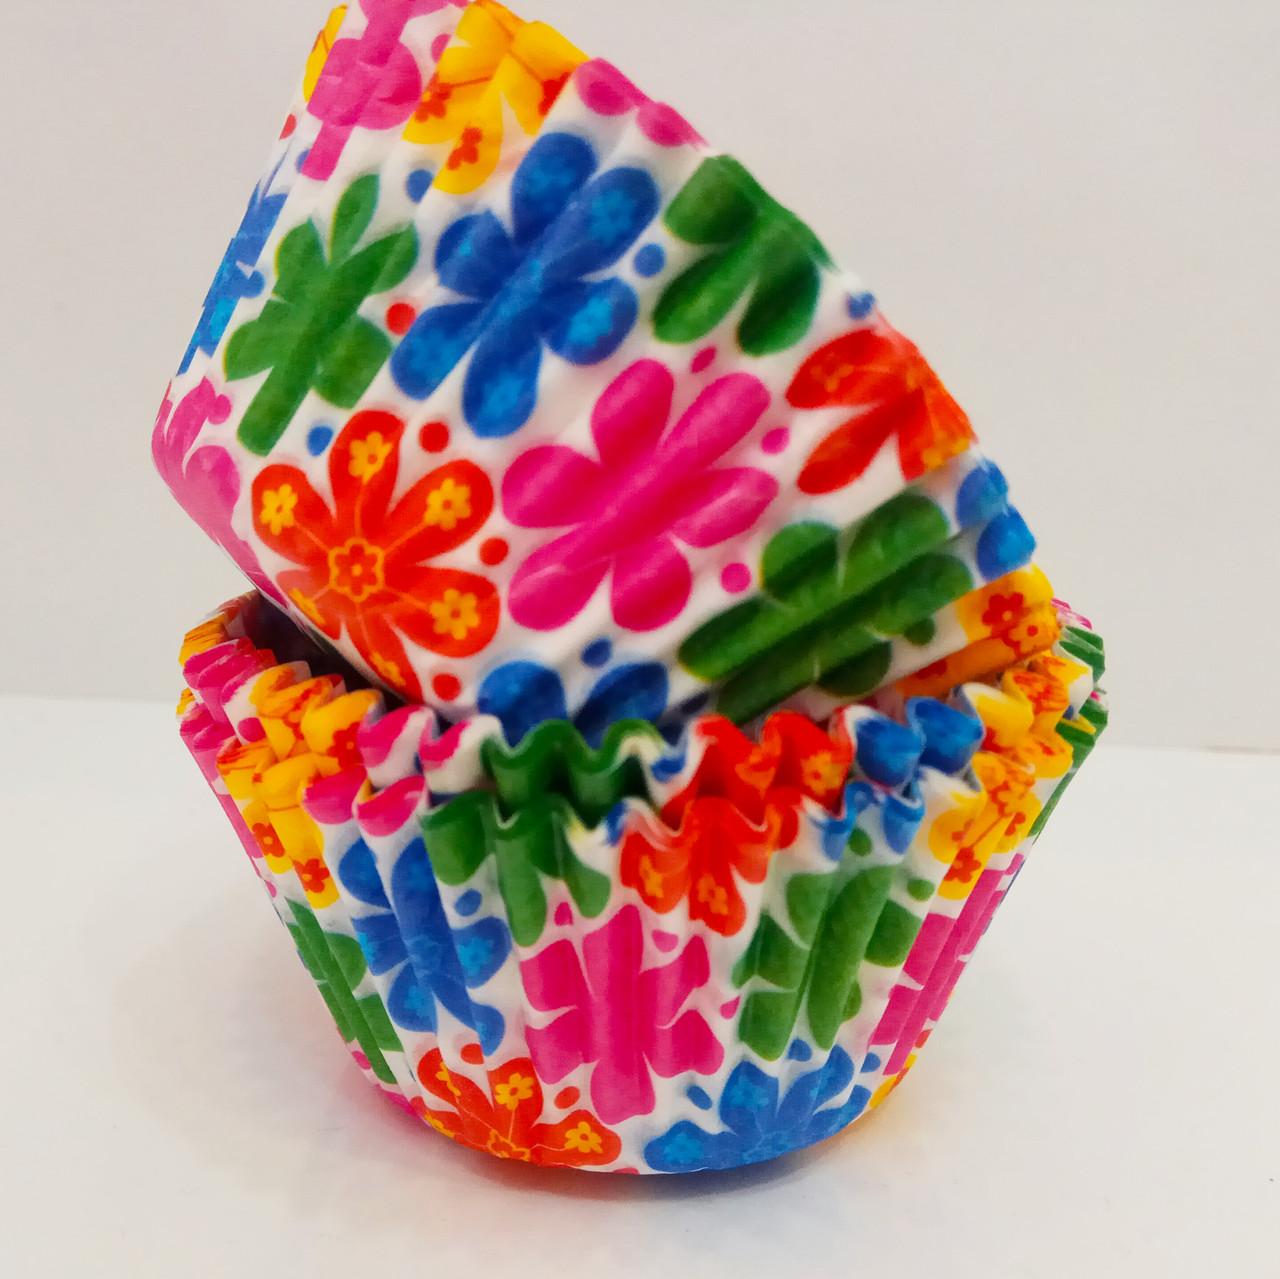 Форма бумажная для кексов тарталетка  500 шт.